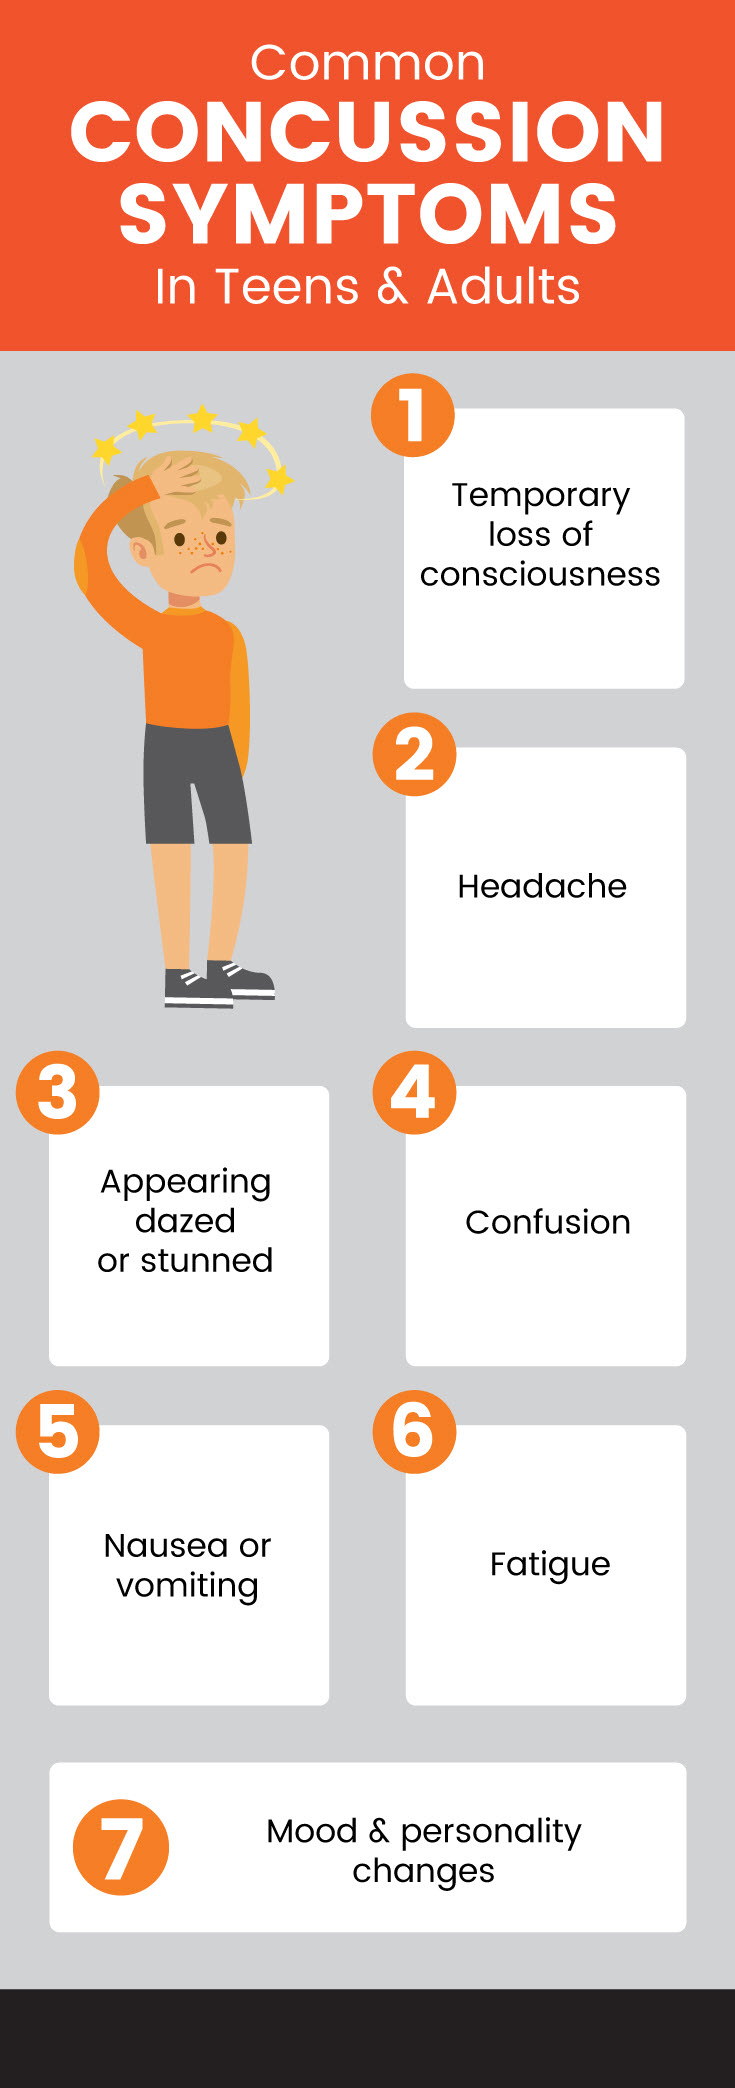 Common Concussion Symptoms - MKexpress.net